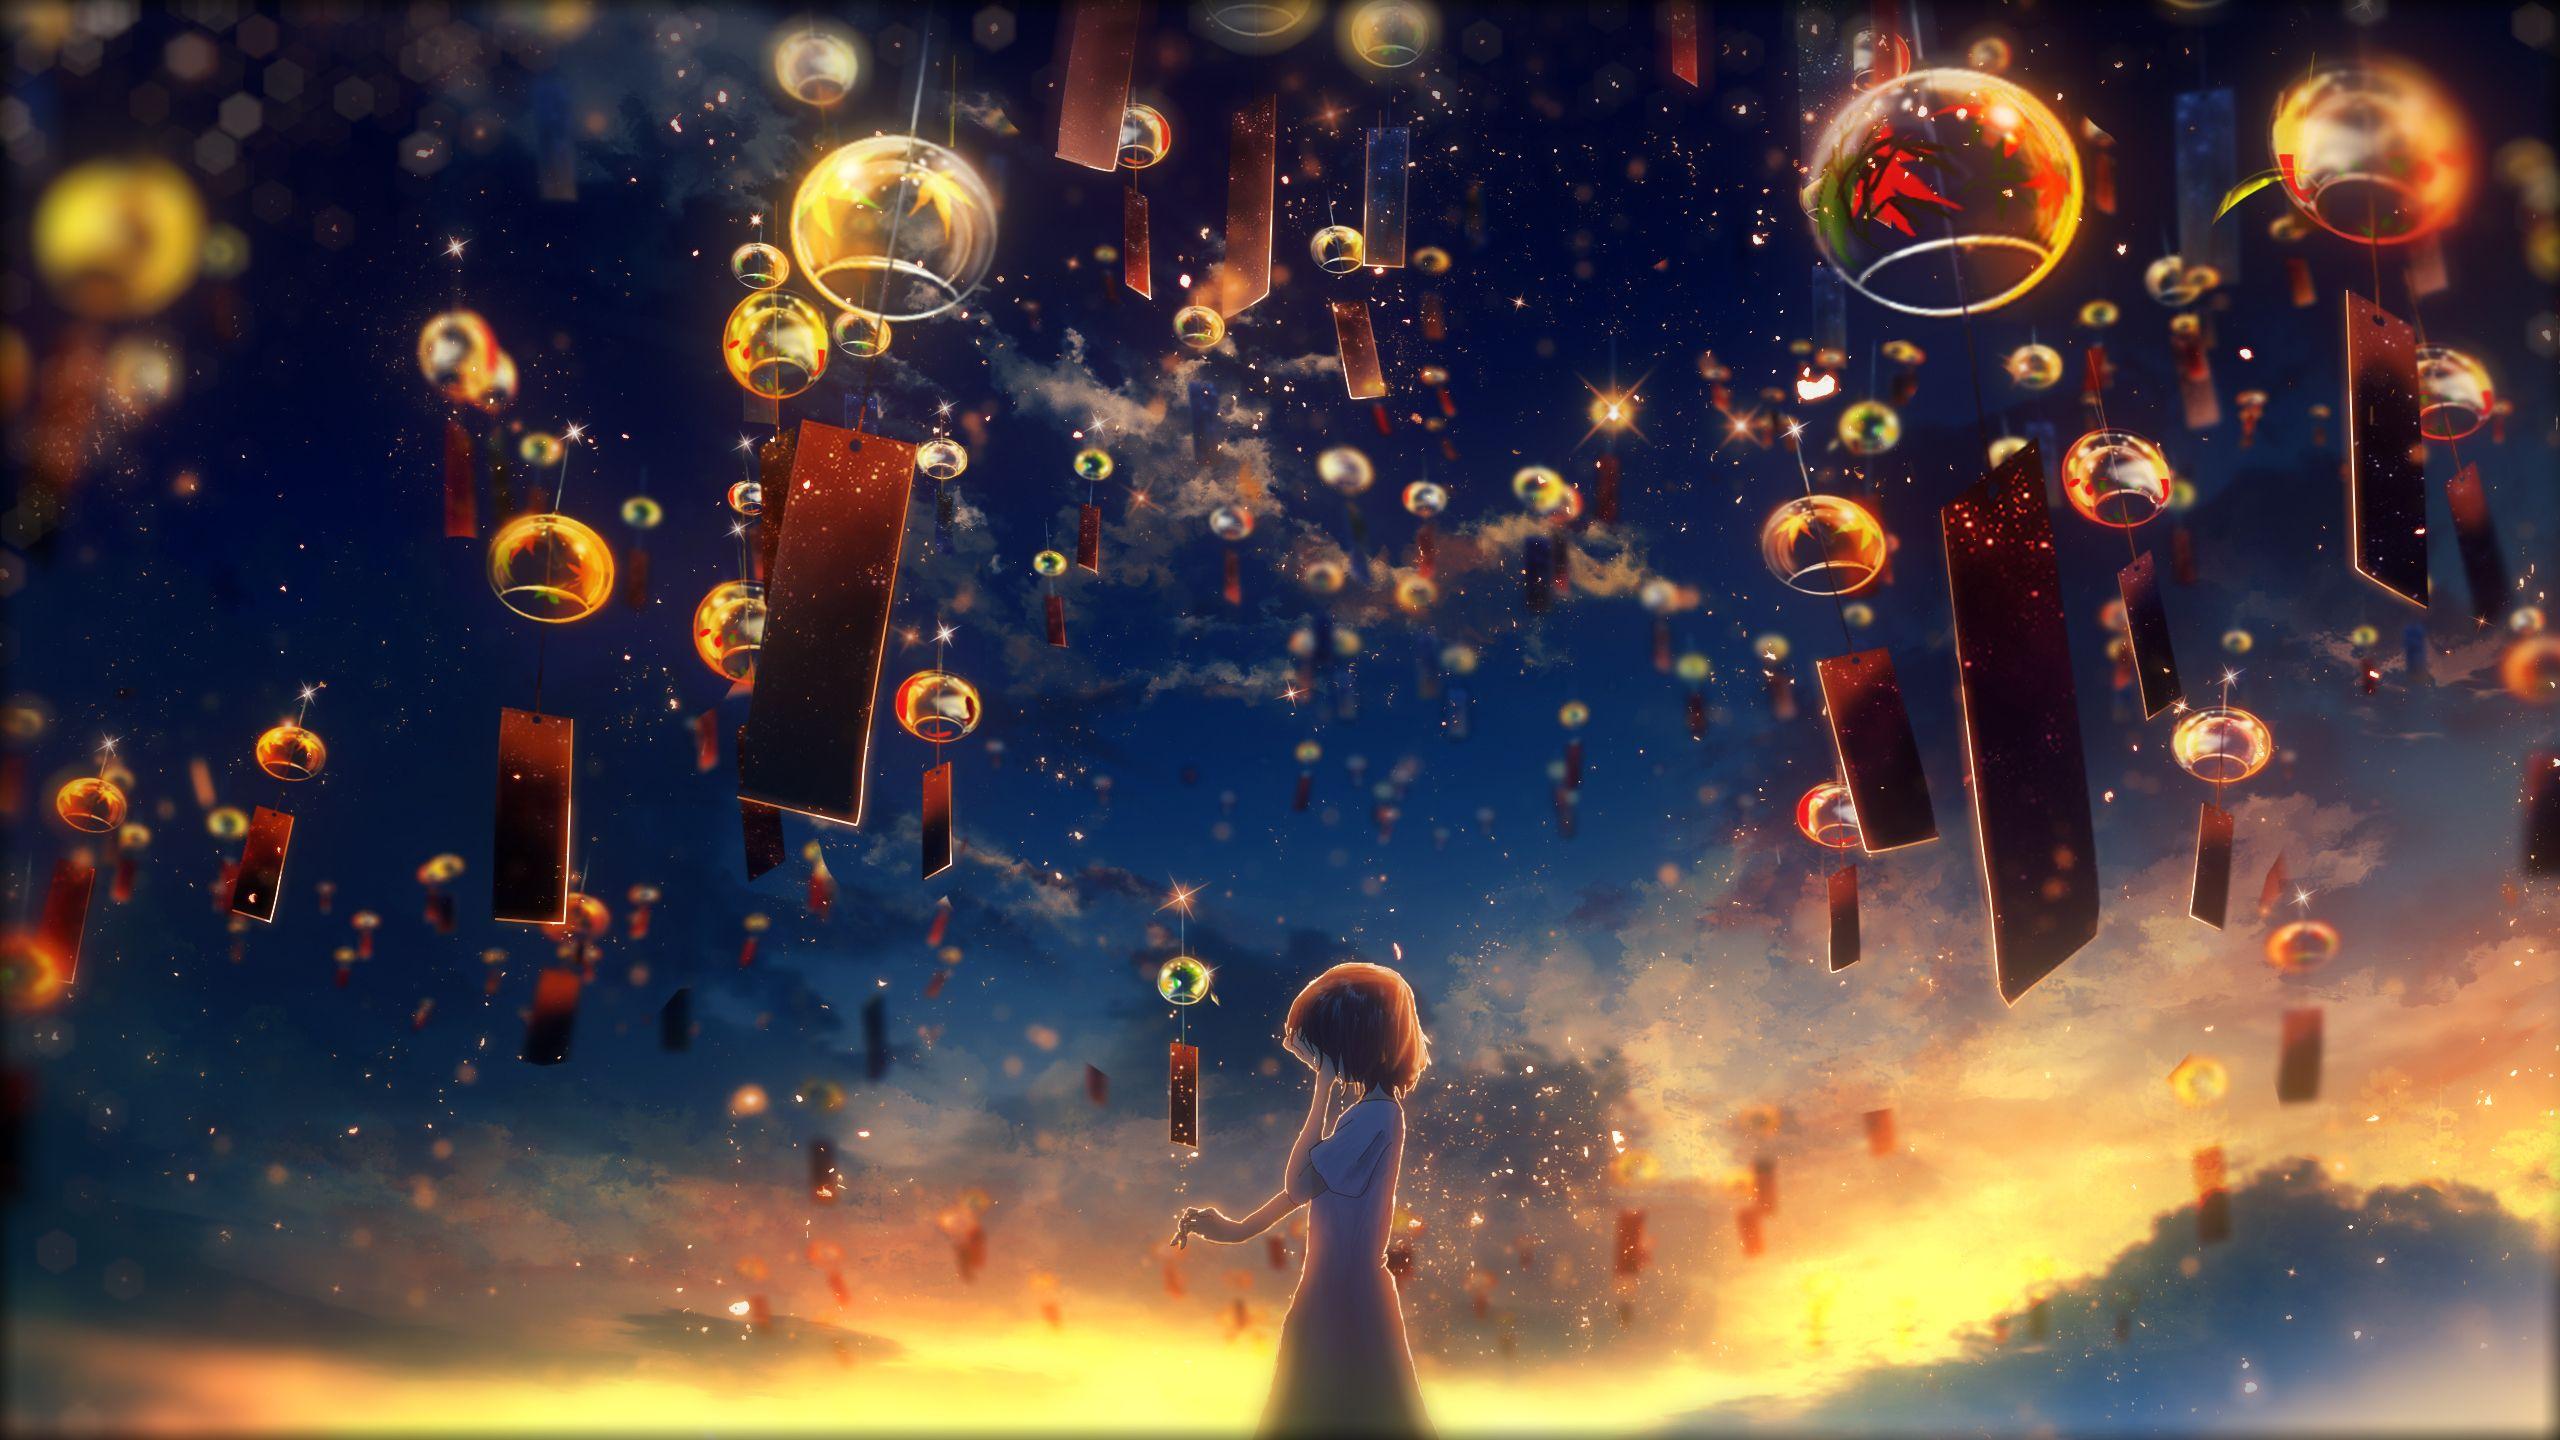 Оч красиво🧡 Pemandangan anime, Gadis animasi, Animasi